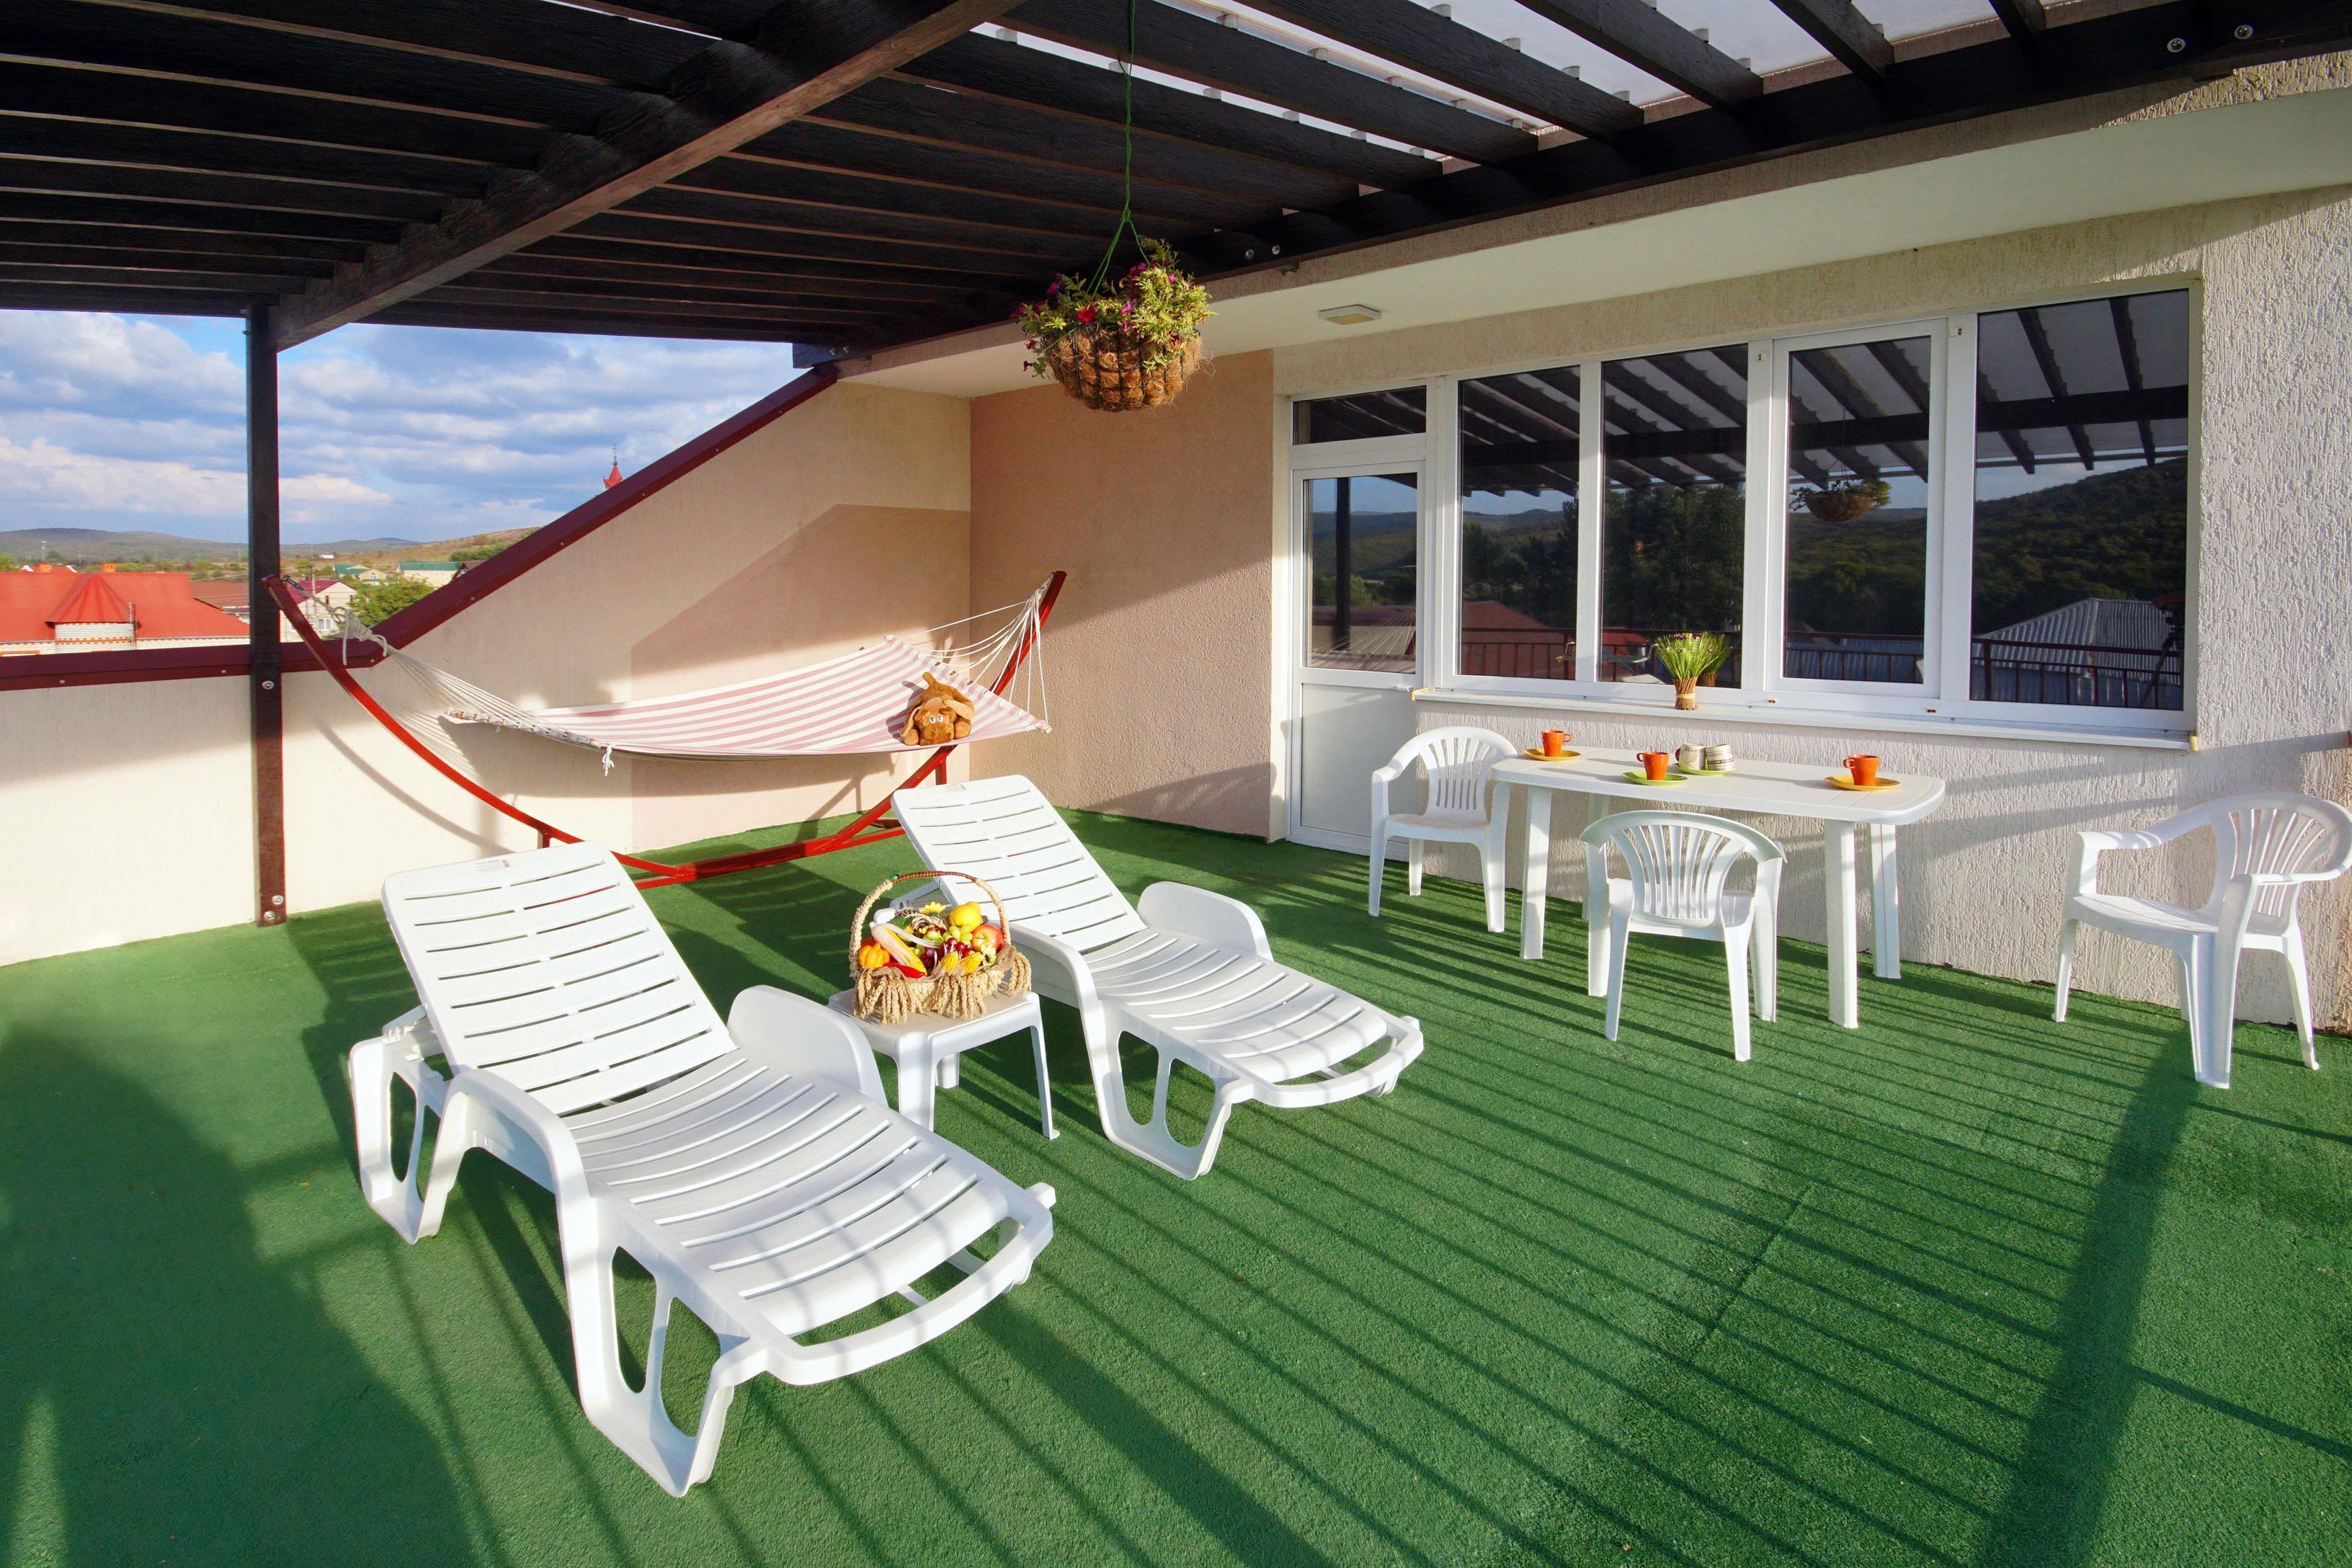 Сукко фото поселка и пляжа гостевые дома